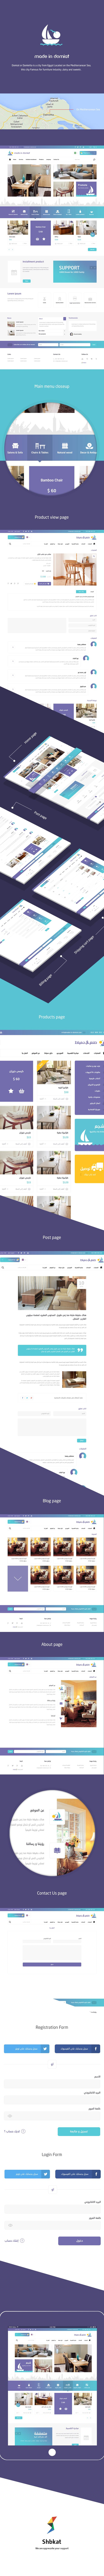 Made in domiat website design UI/UX